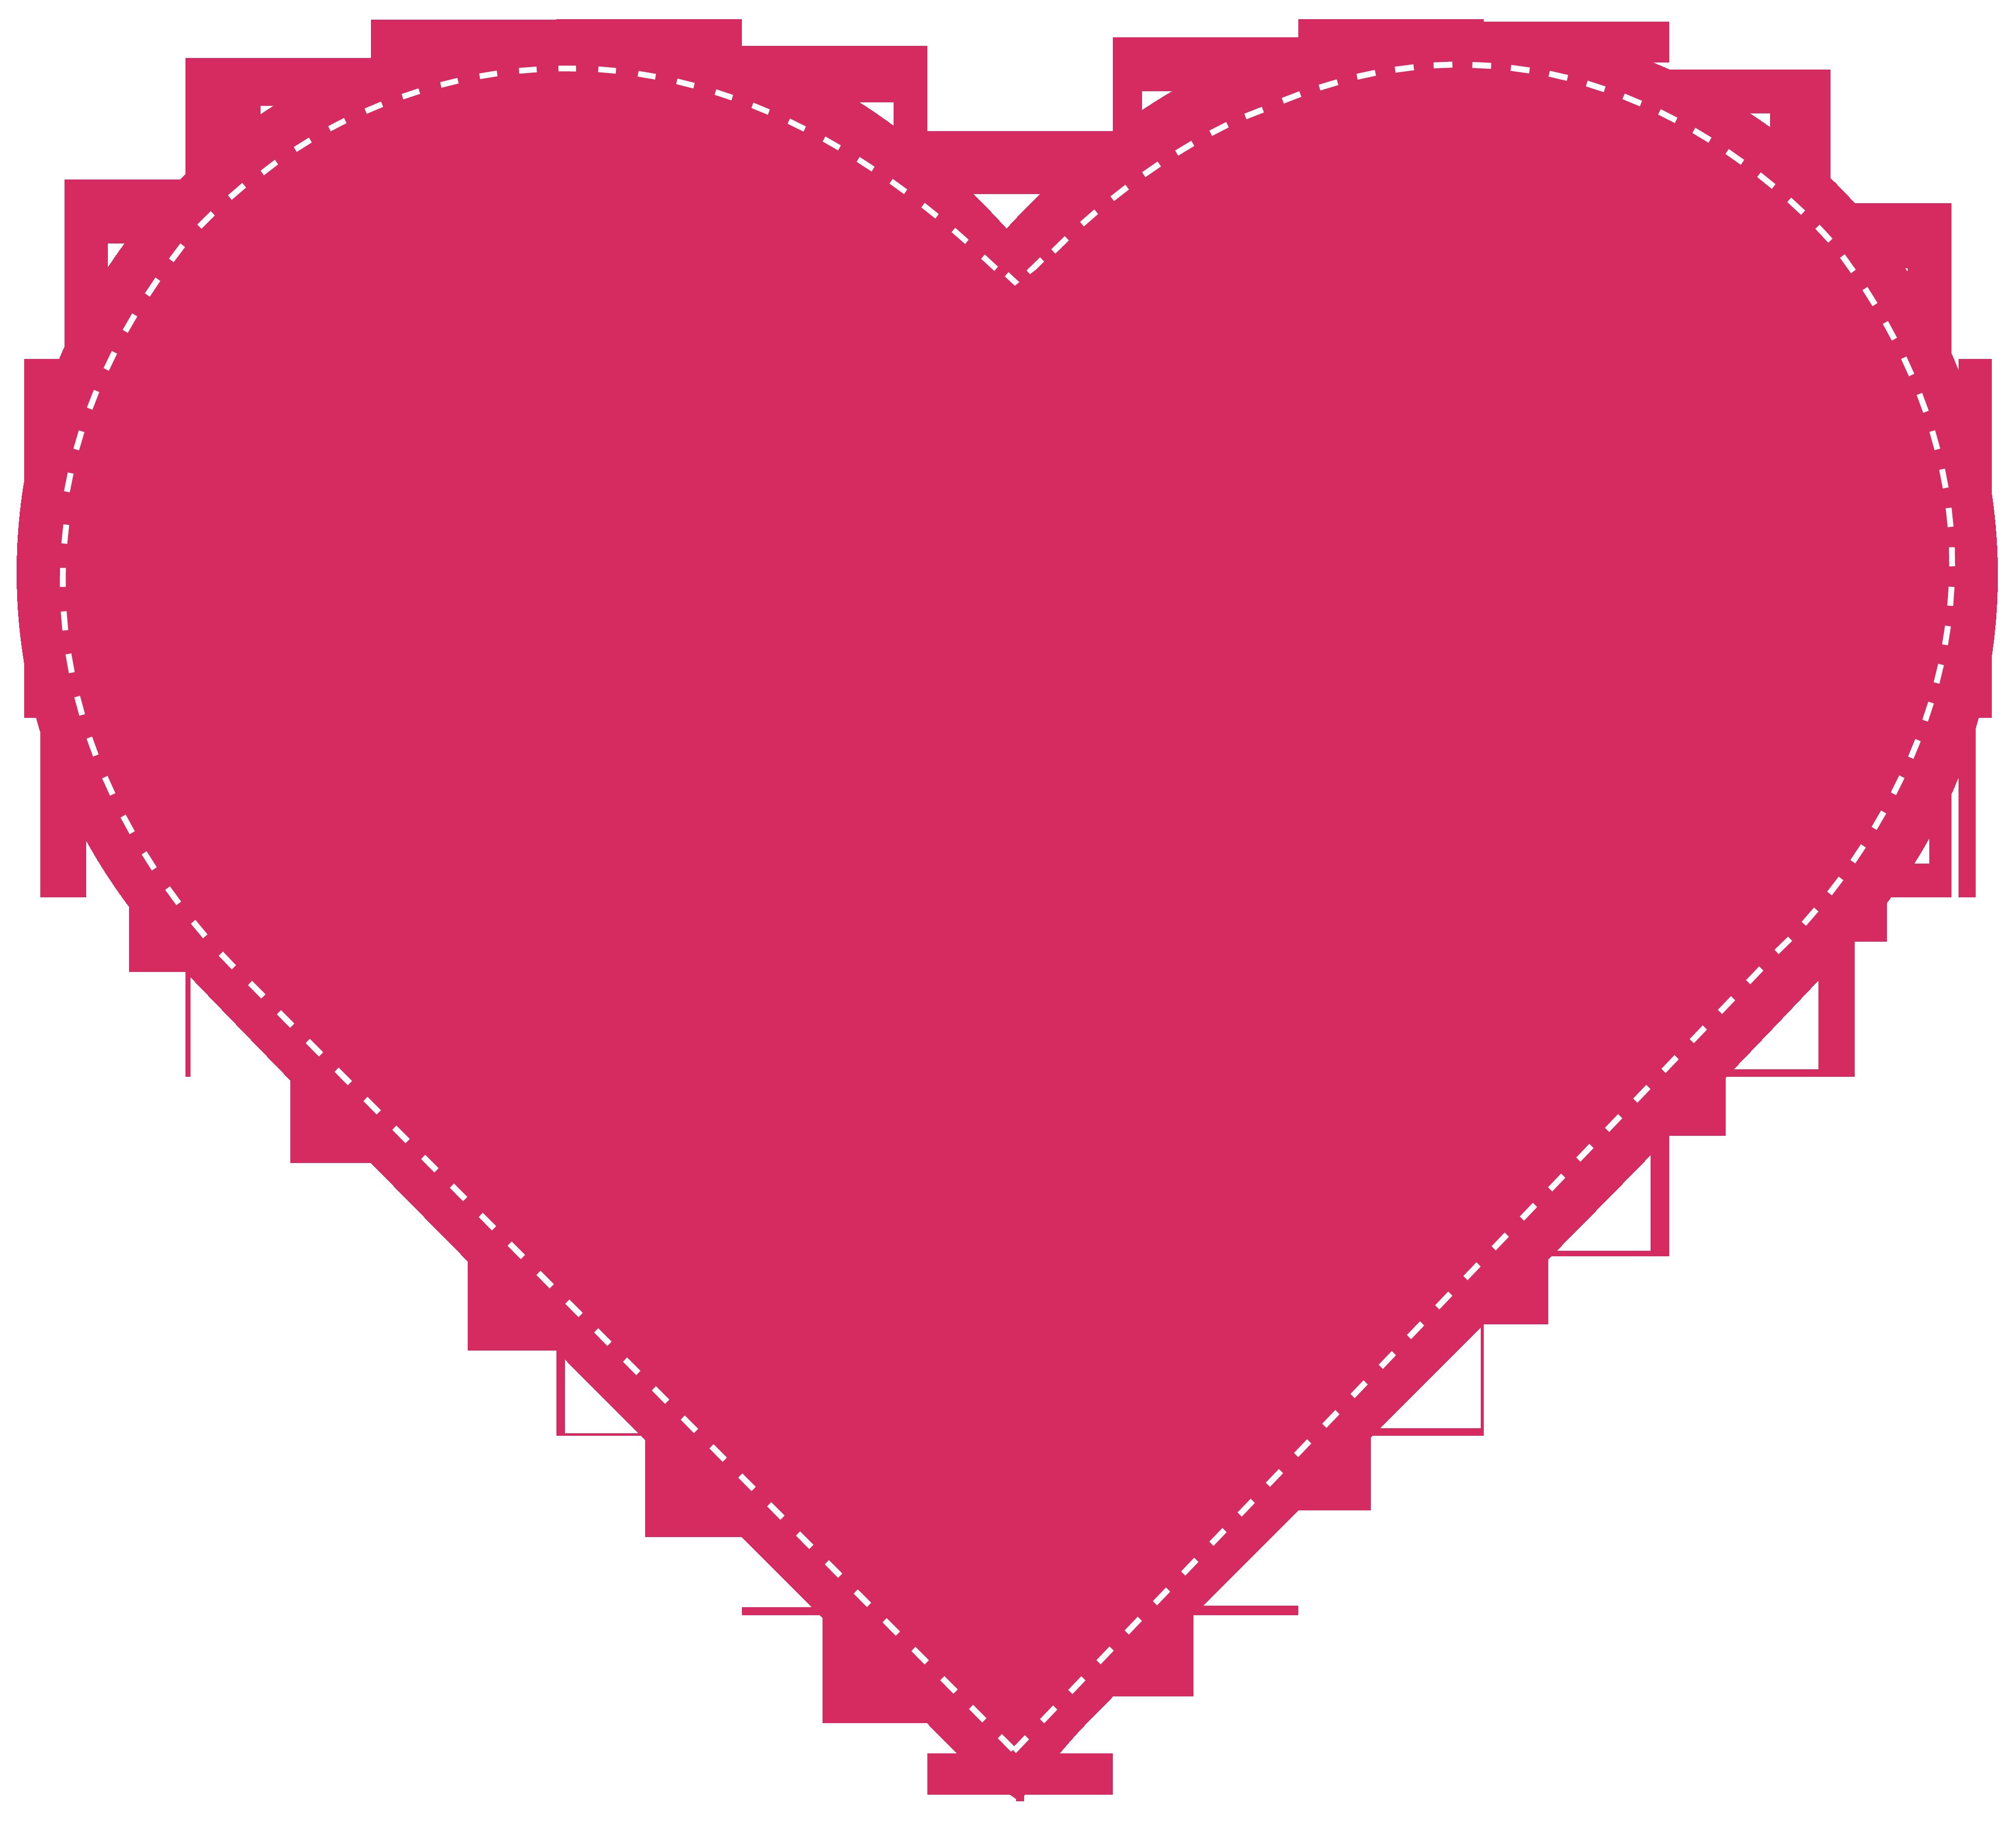 Heart Png Hdpng.com 4000 - Heart, Transparent background PNG HD thumbnail